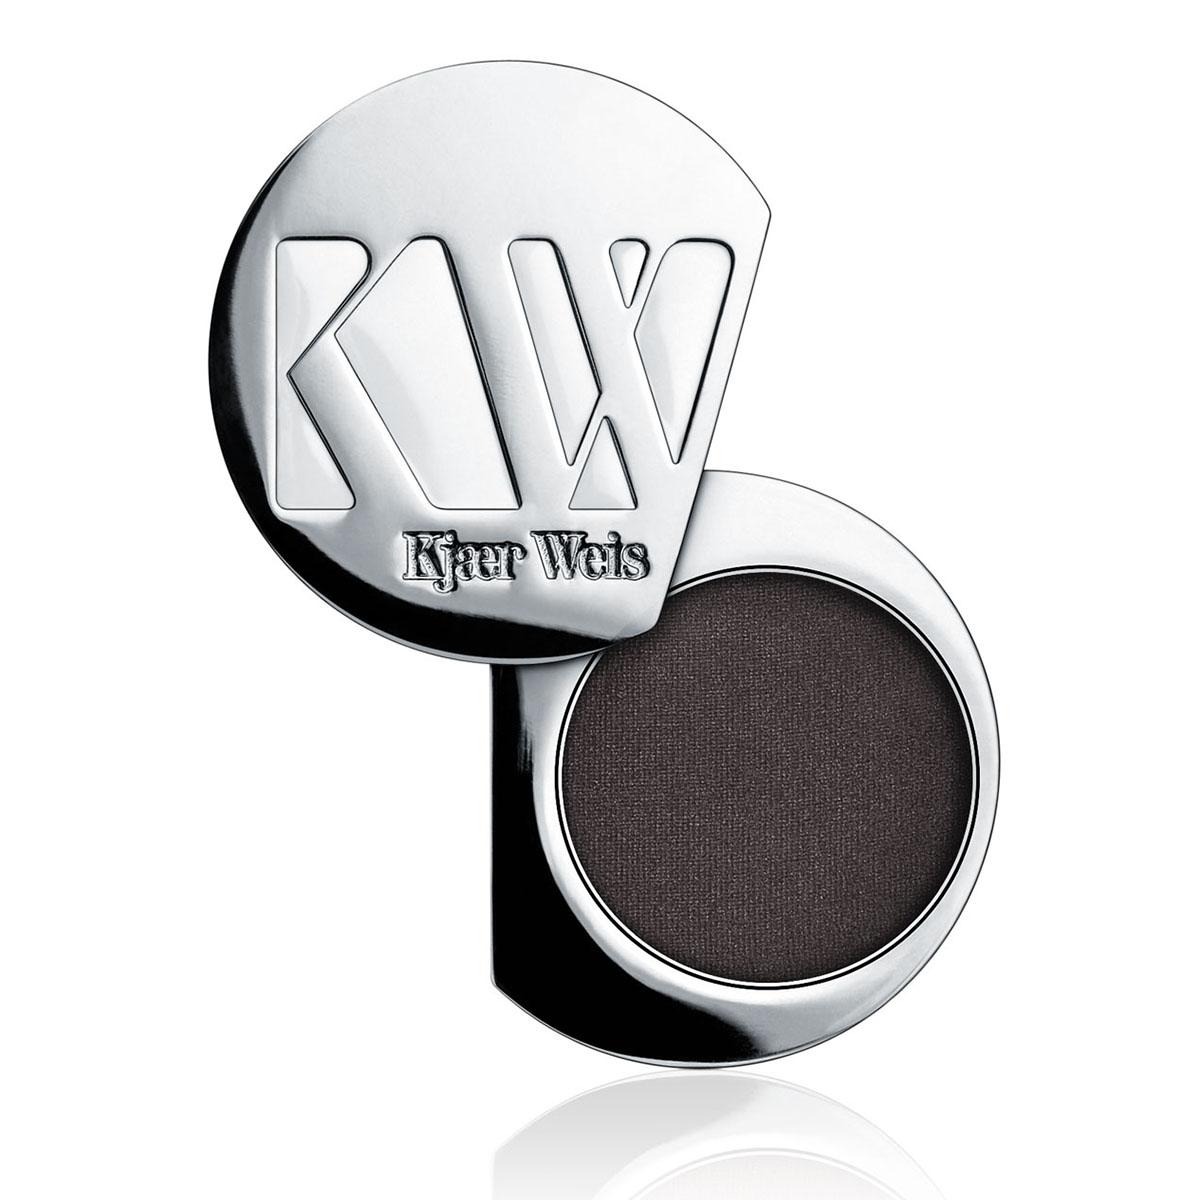 Kjaer Weis Eye Shadow in Onyx